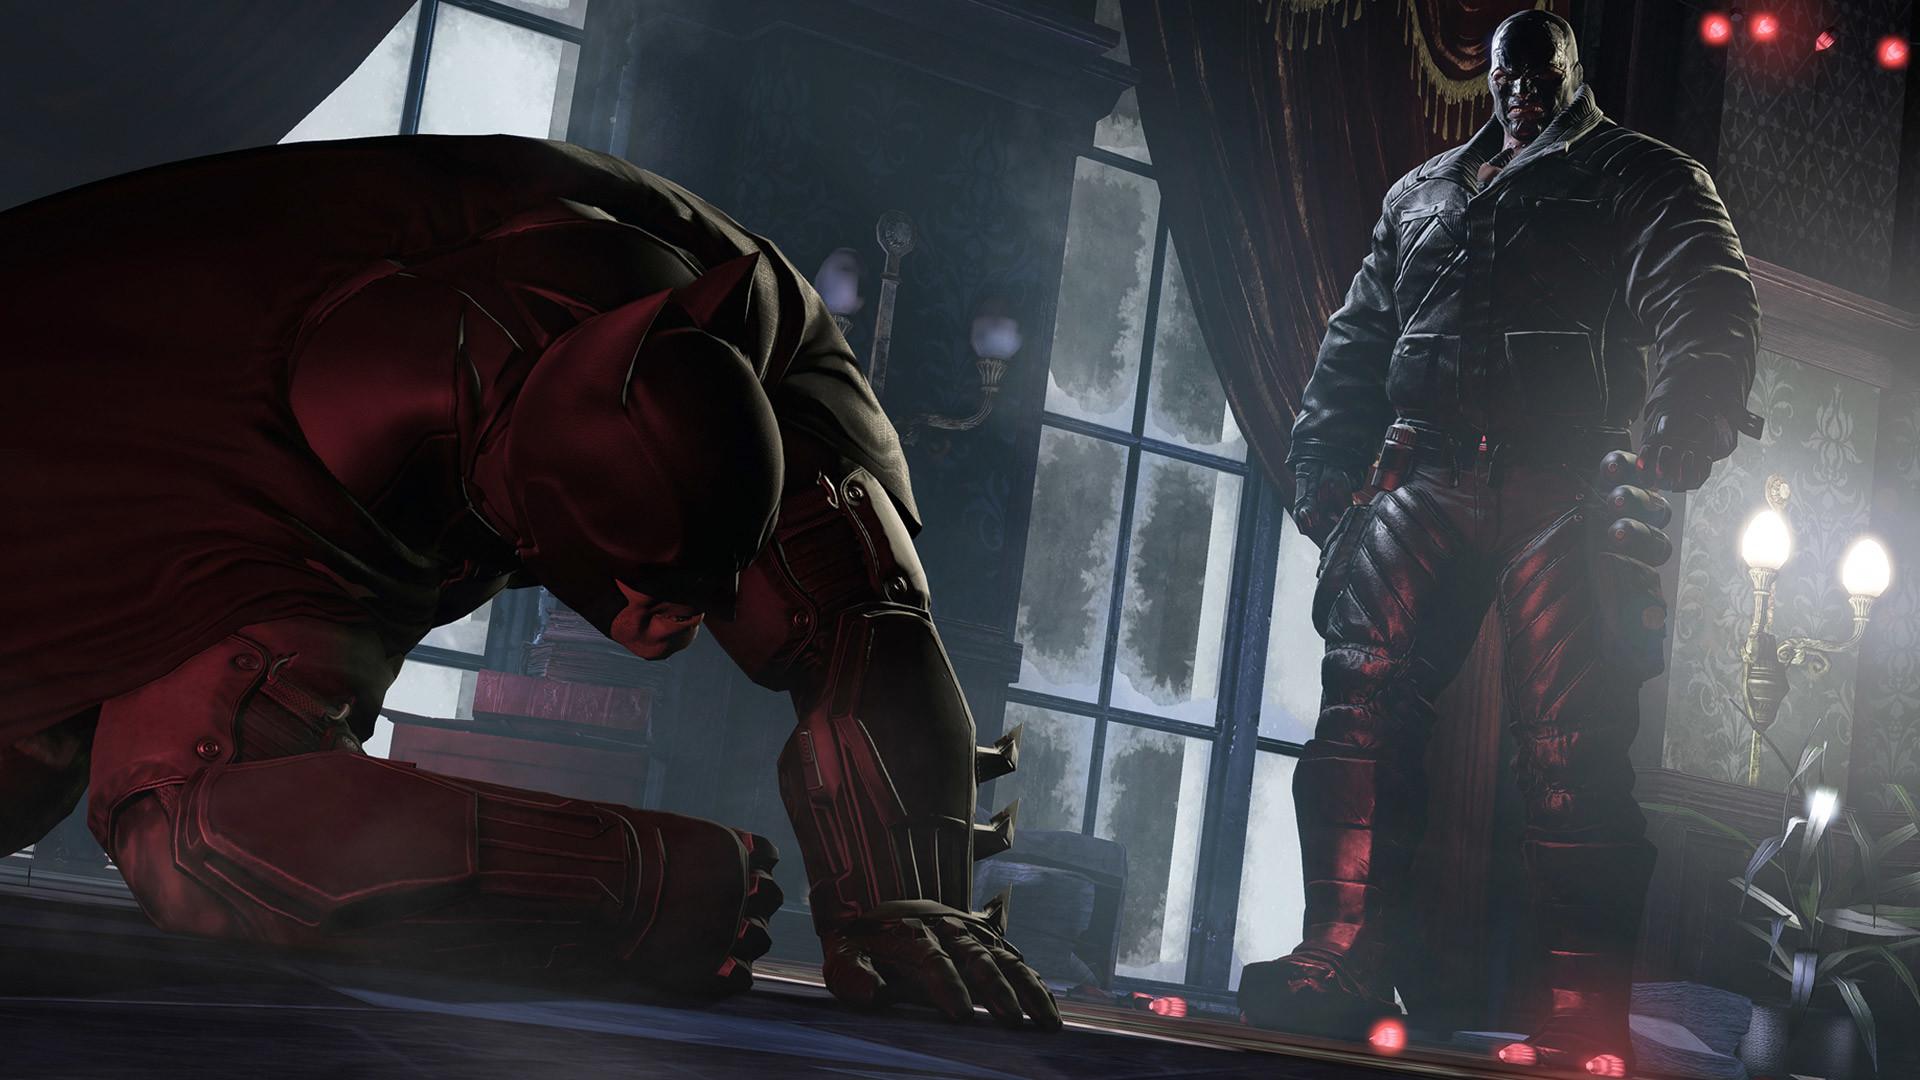 You are downloading Batman Arkham Origins wallpaper 14. download wallpaper